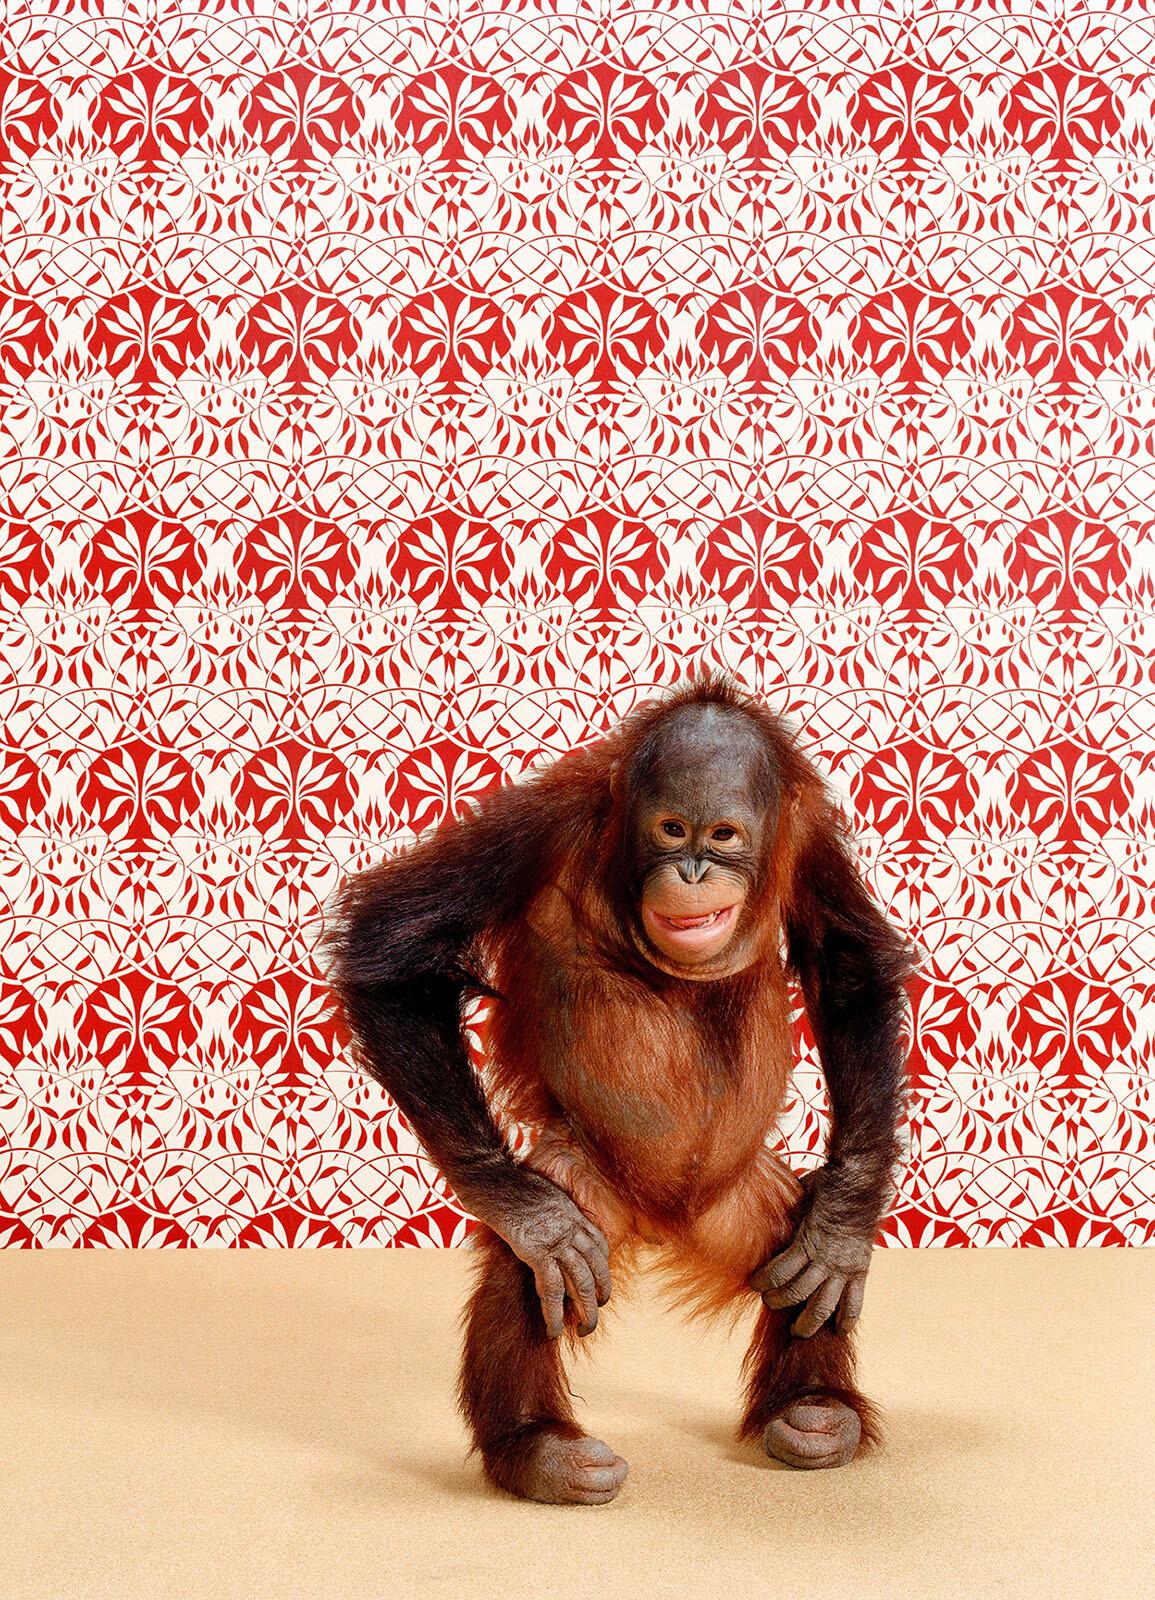 Orangutan 6 - Catherine Ledner